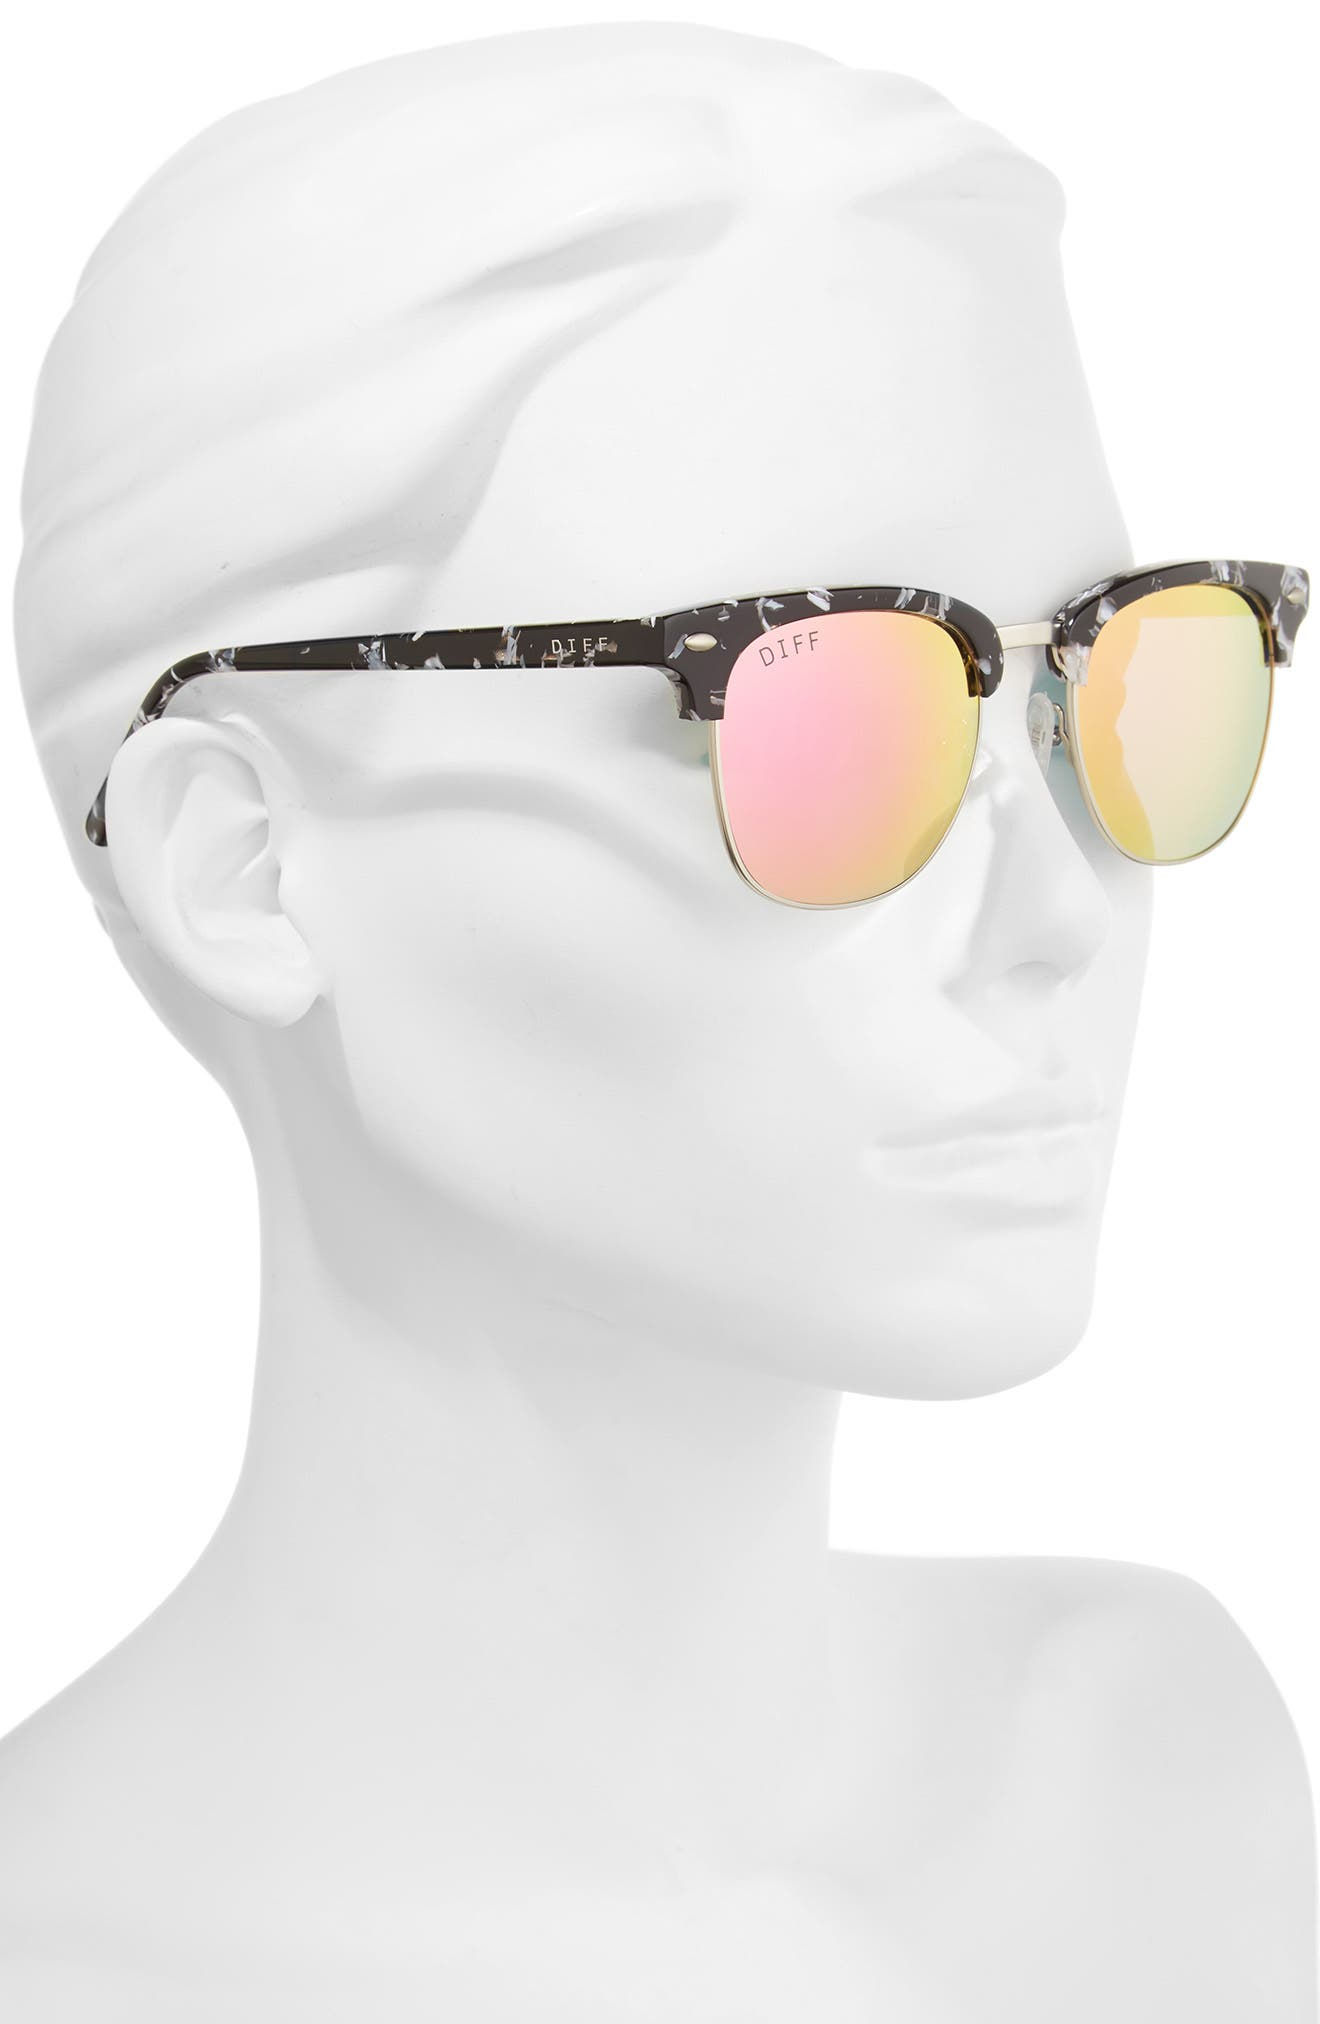 Alternate Image 2  - DIFF Barry 51mm Polarized Retro Sunglasses